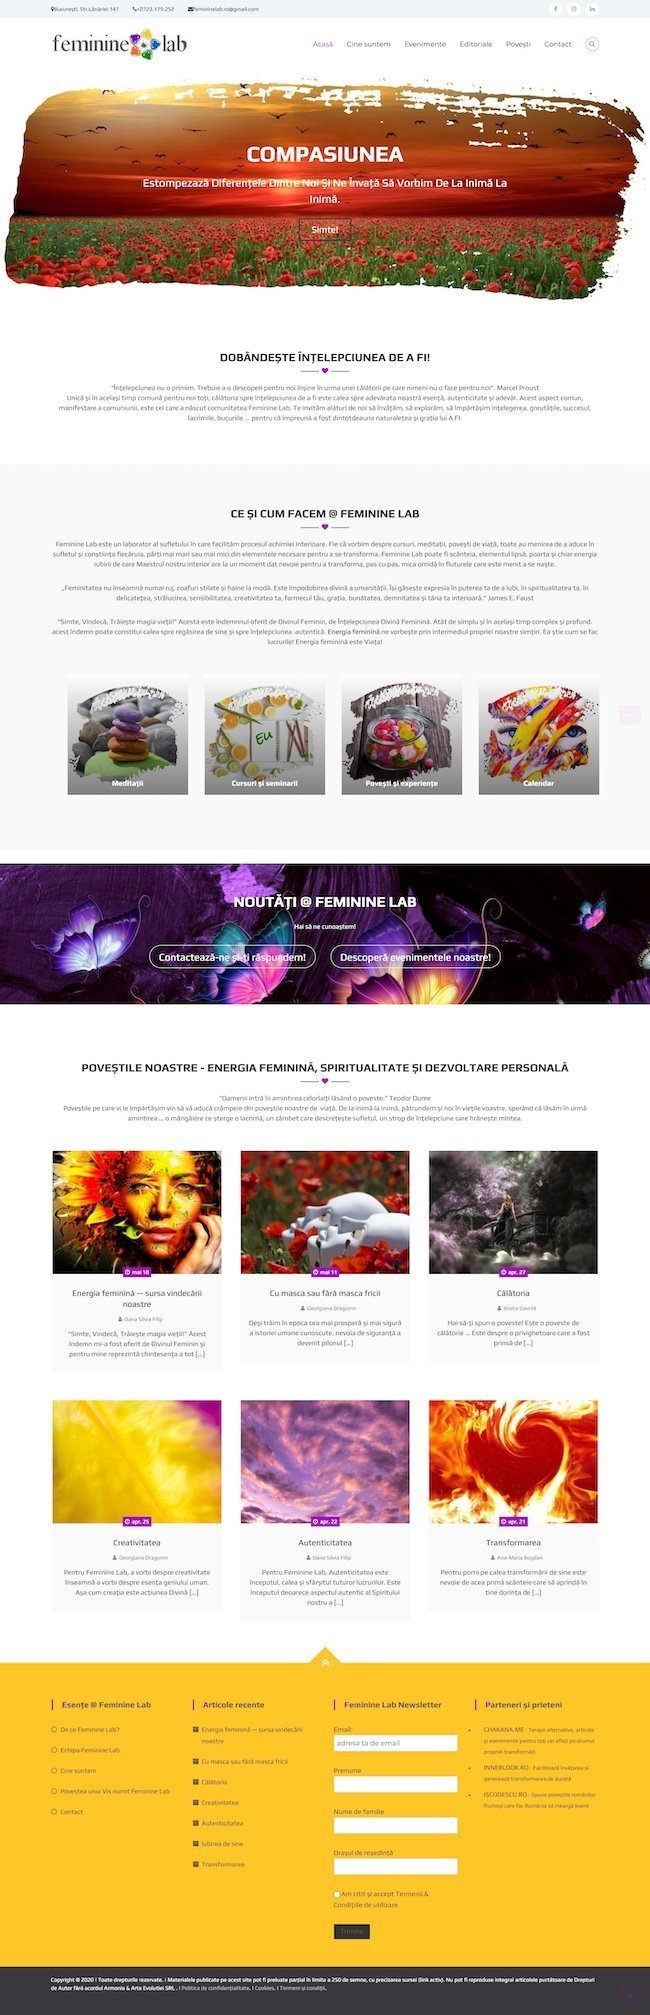 Feminine Lab website homepage